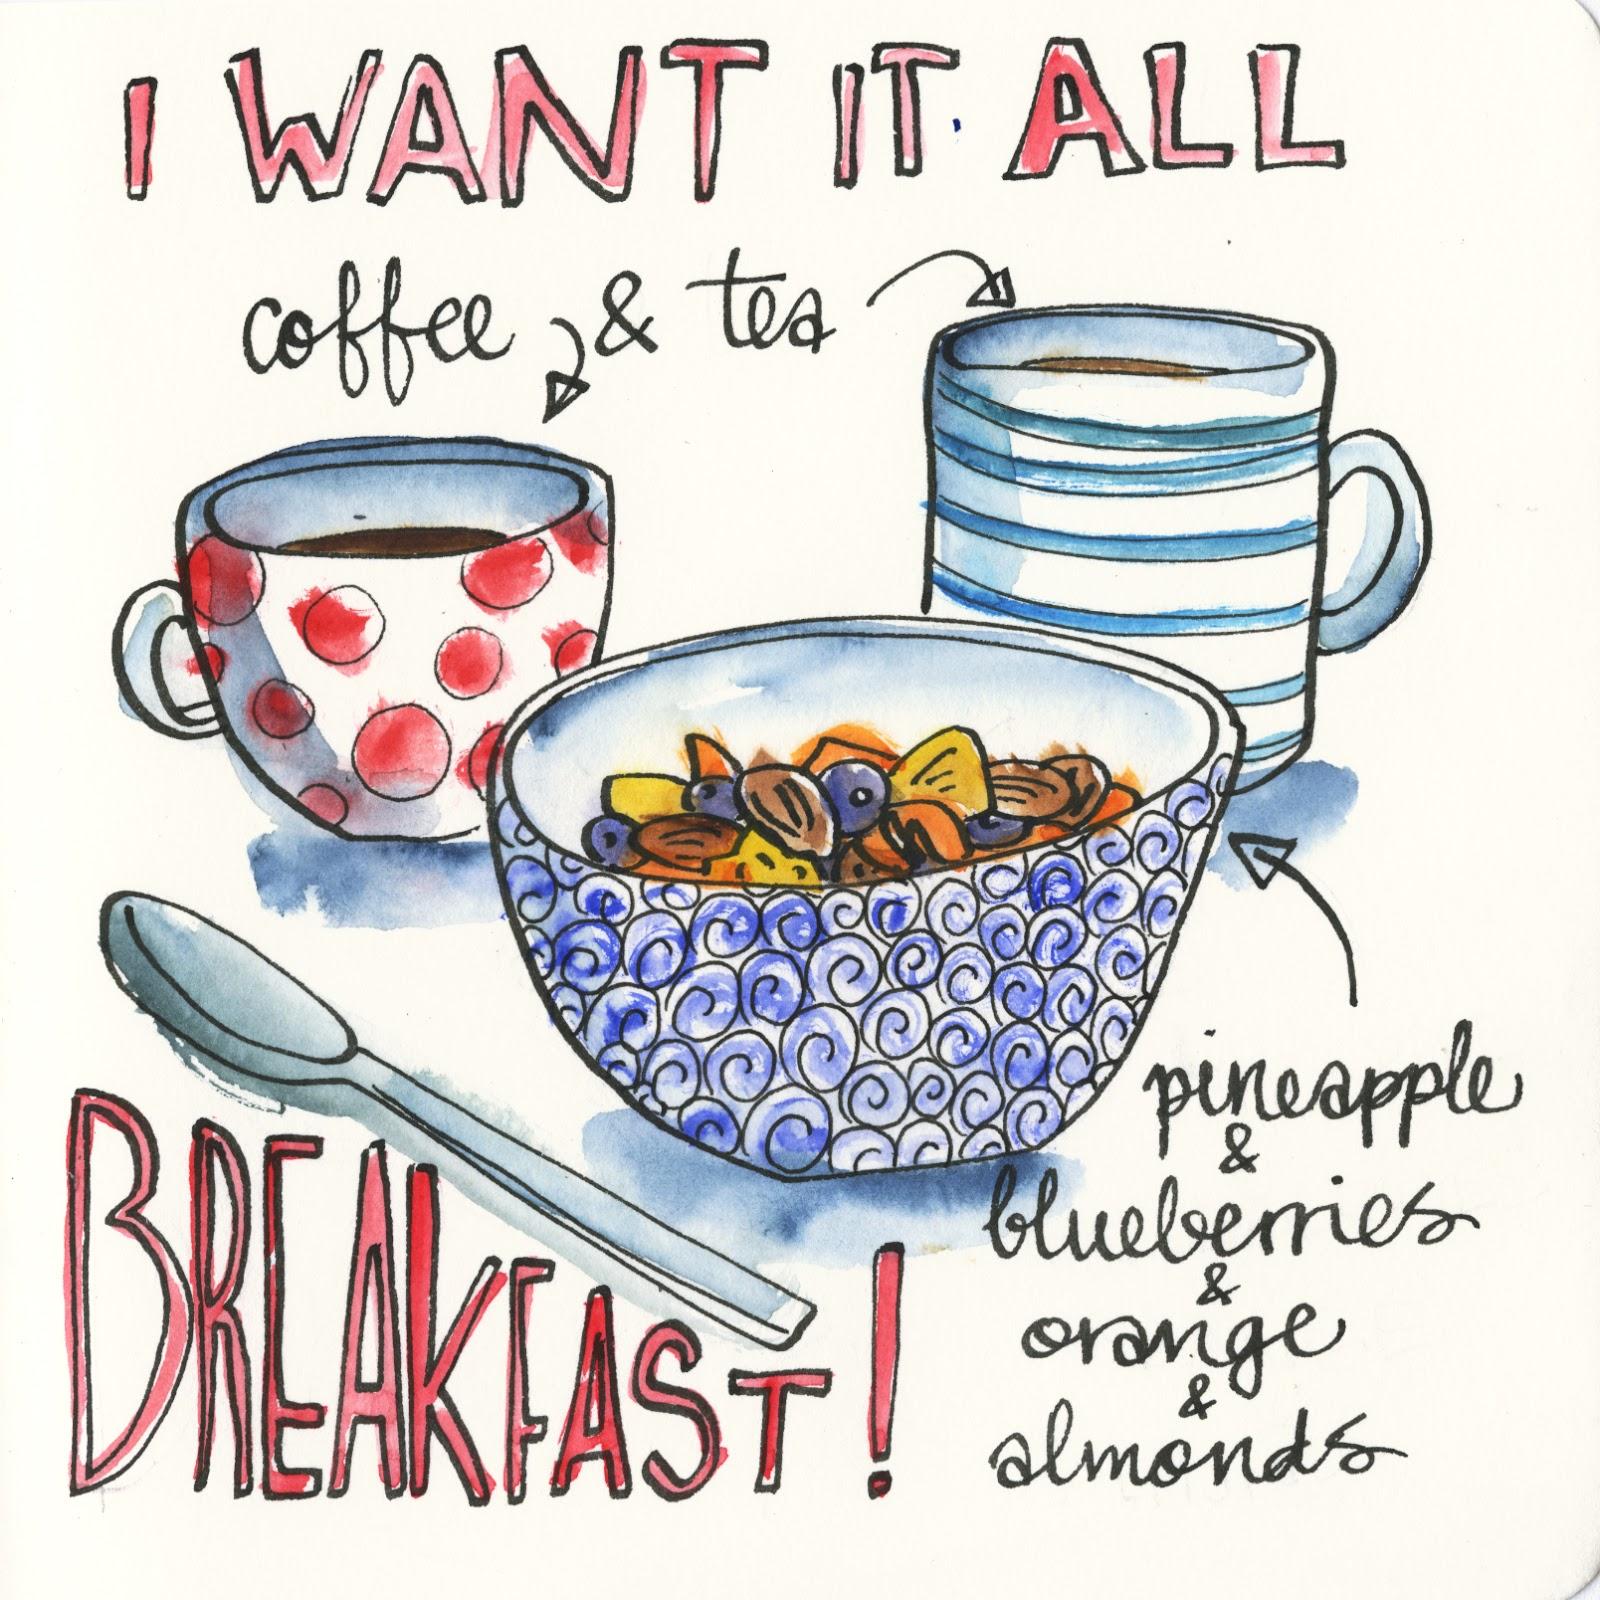 1600x1600 Art During Breakfast